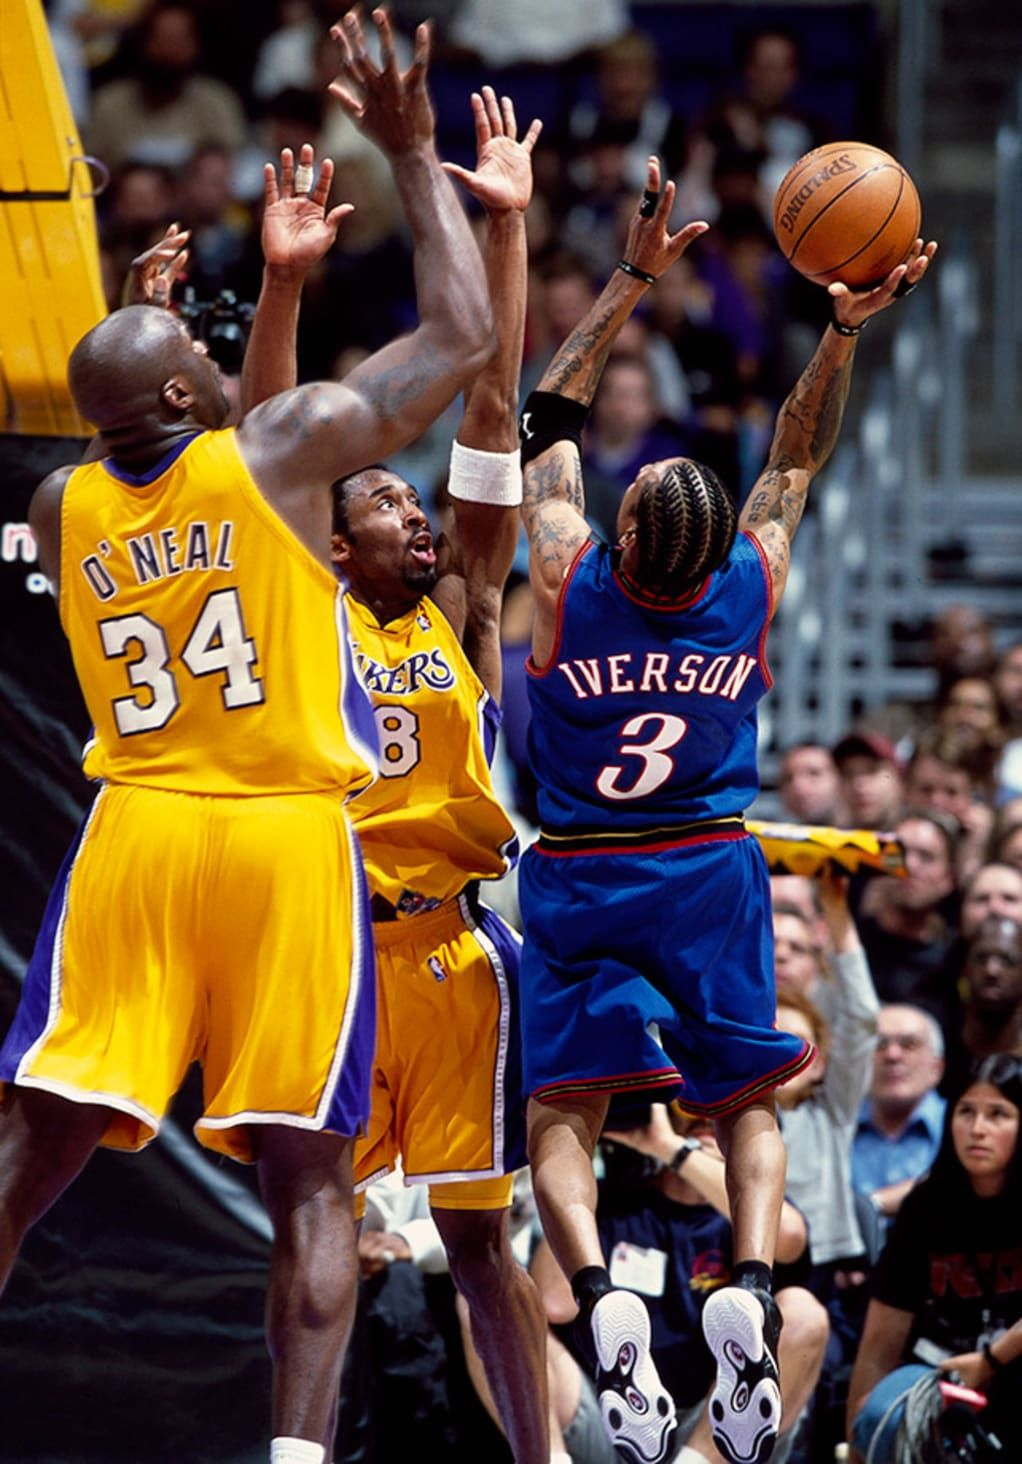 100 Best Kobe Bryant Photos Shaquille o'neal, Nba